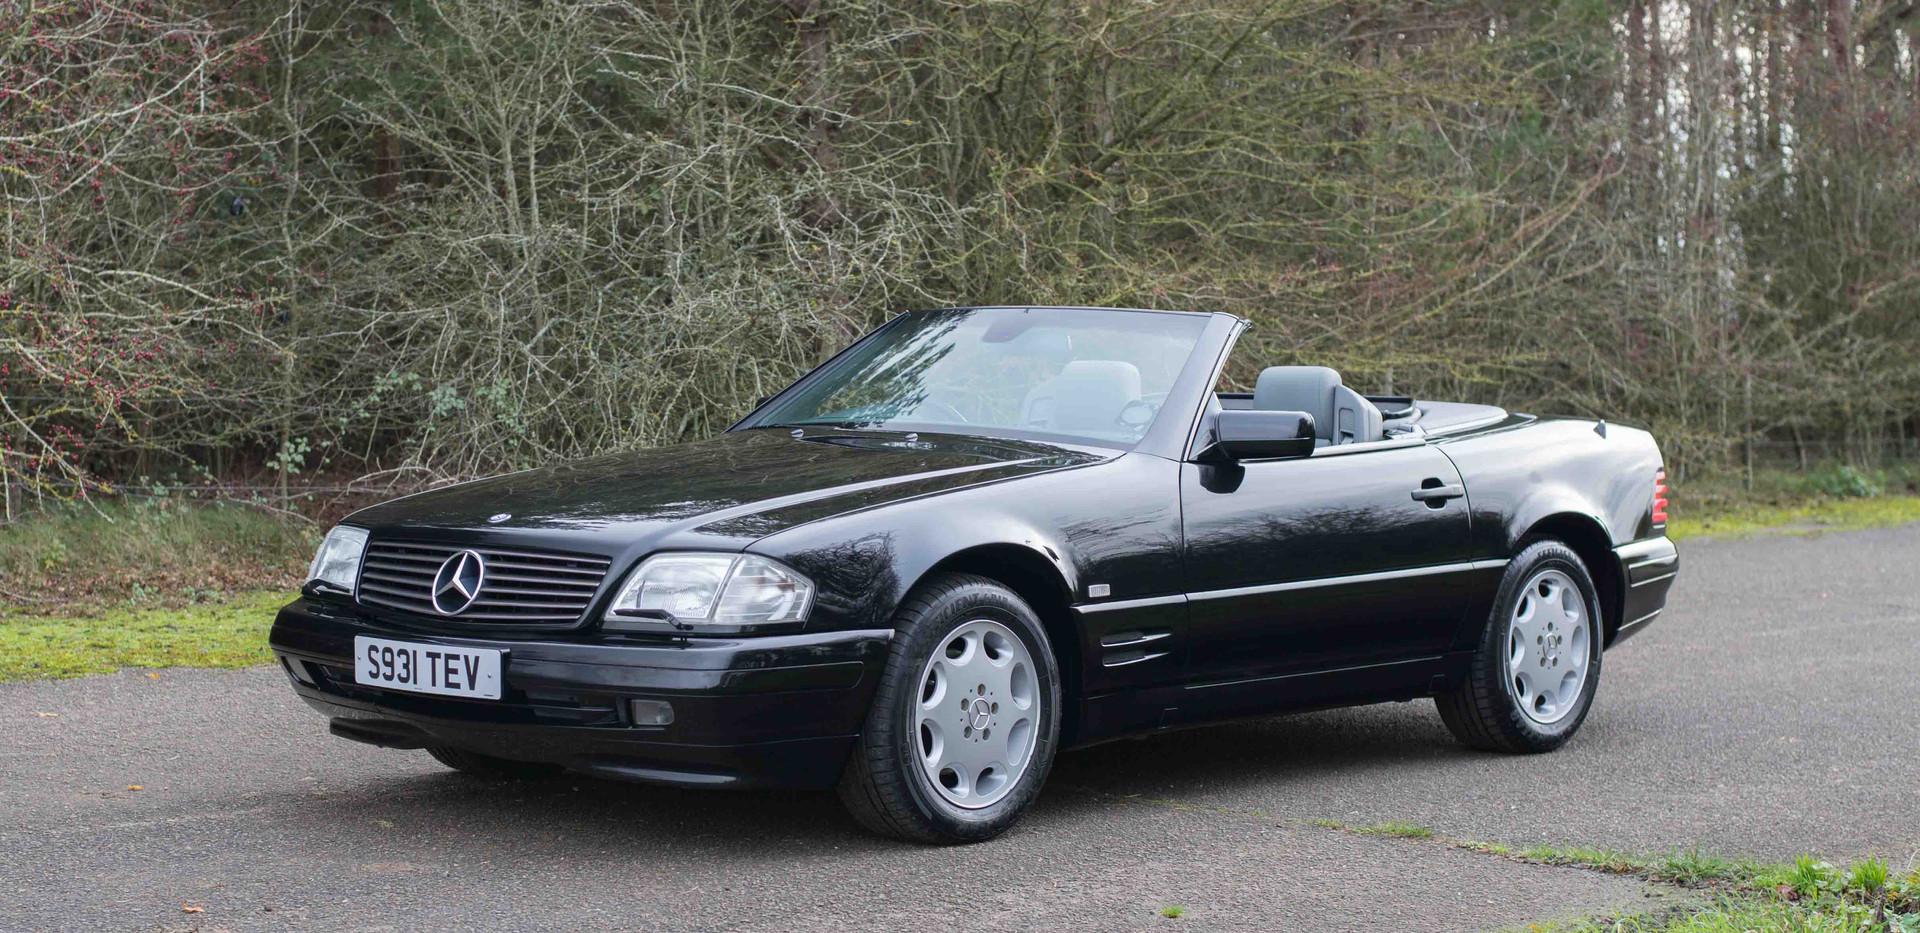 Mercedes R129 SL320 For Sale UK London